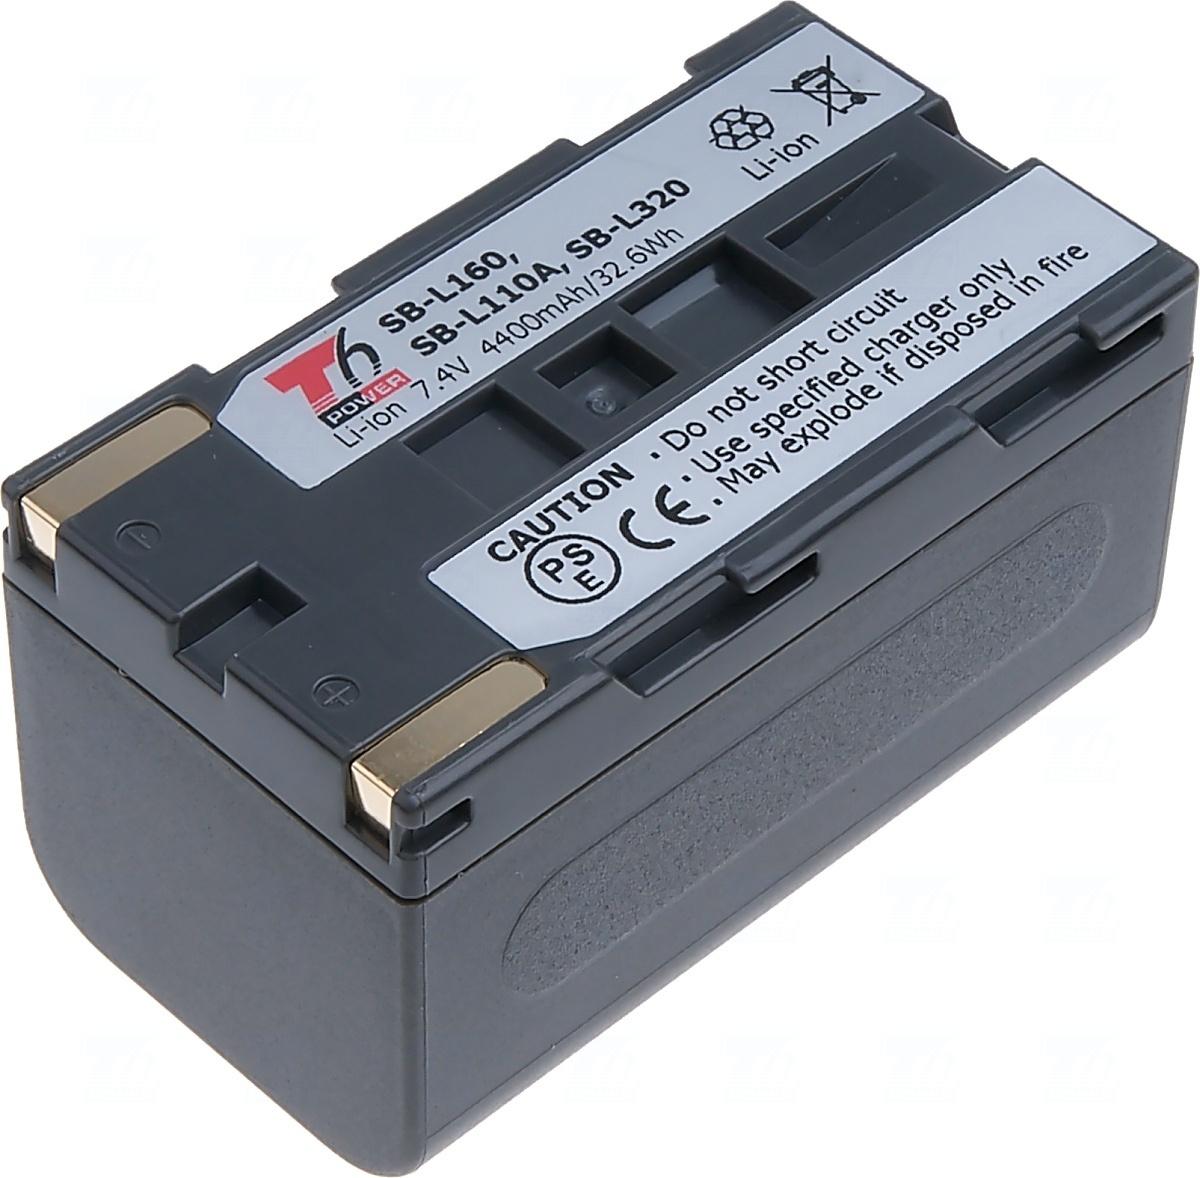 Baterie T6 power SB-L160, SB-L110A, SB-L320, šedá